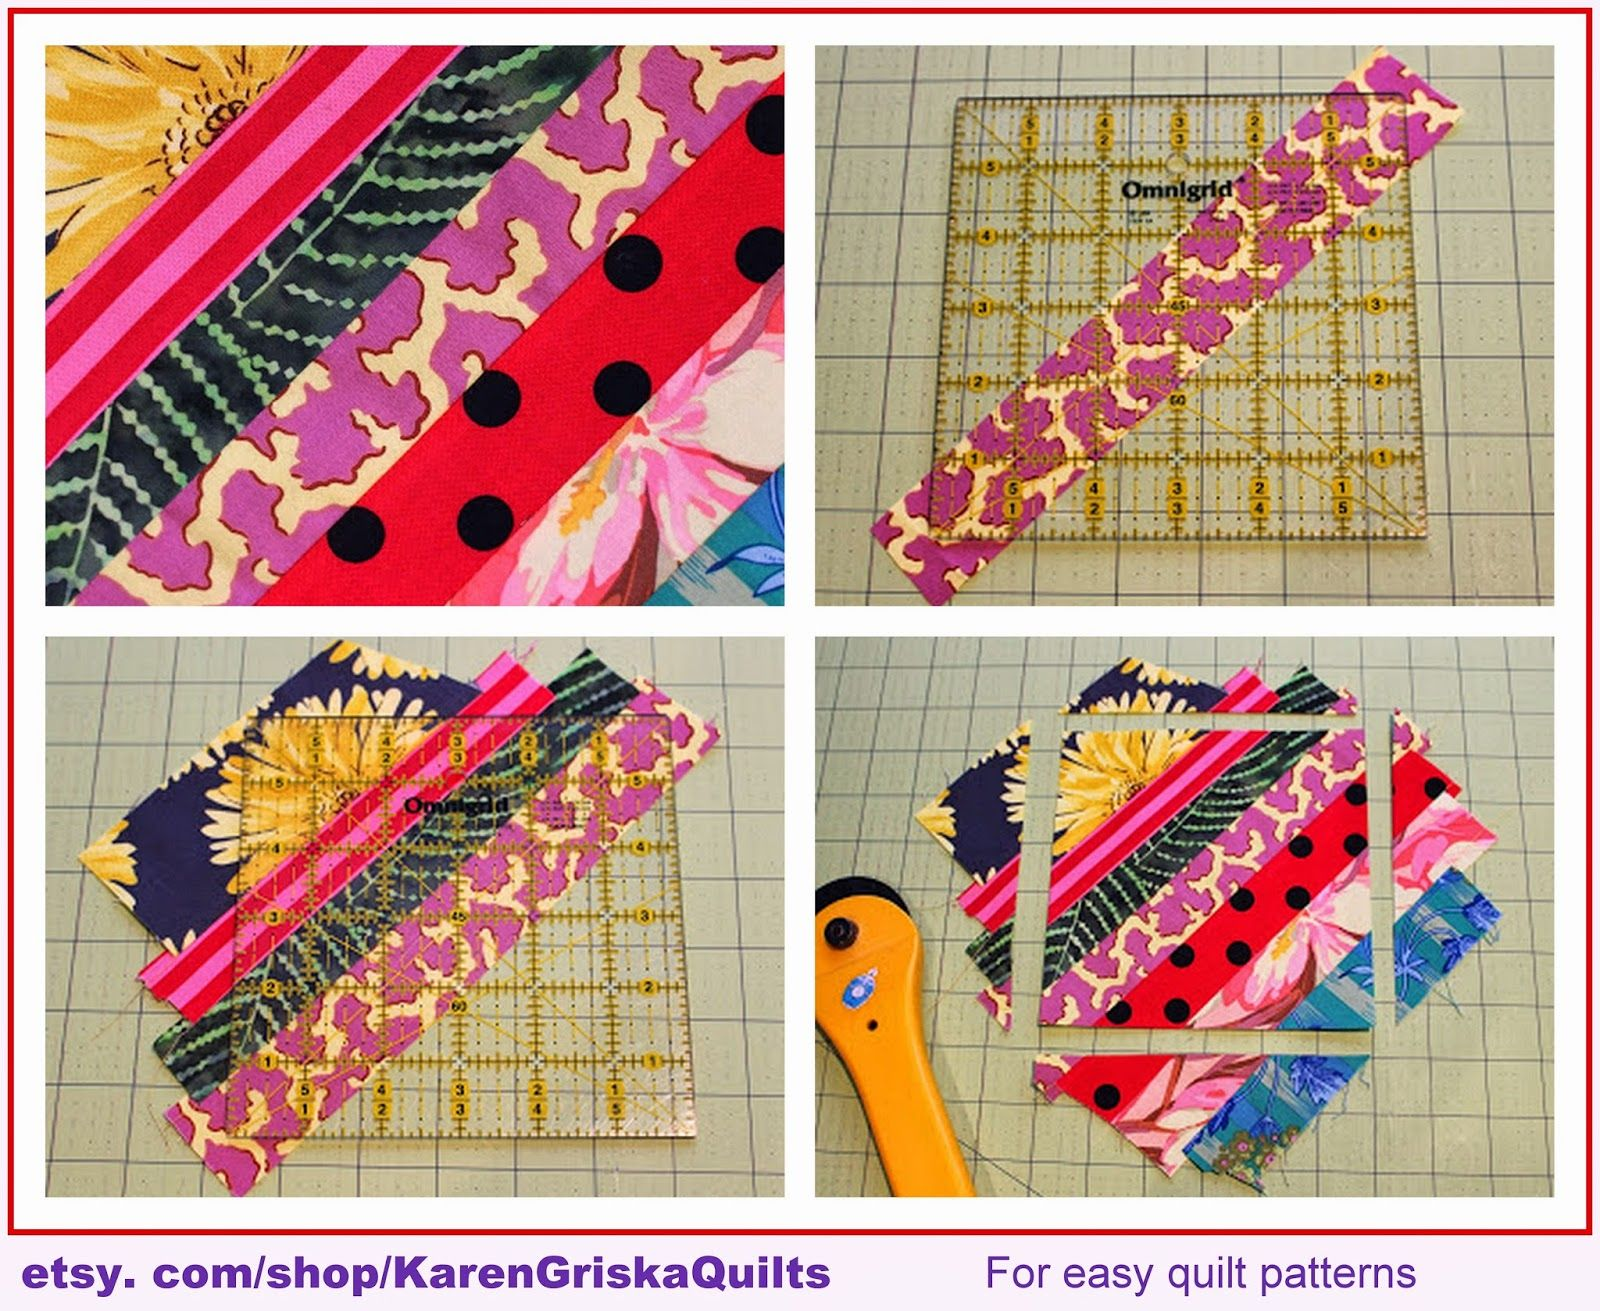 Karen Griska Quilts: String Quilt How-To